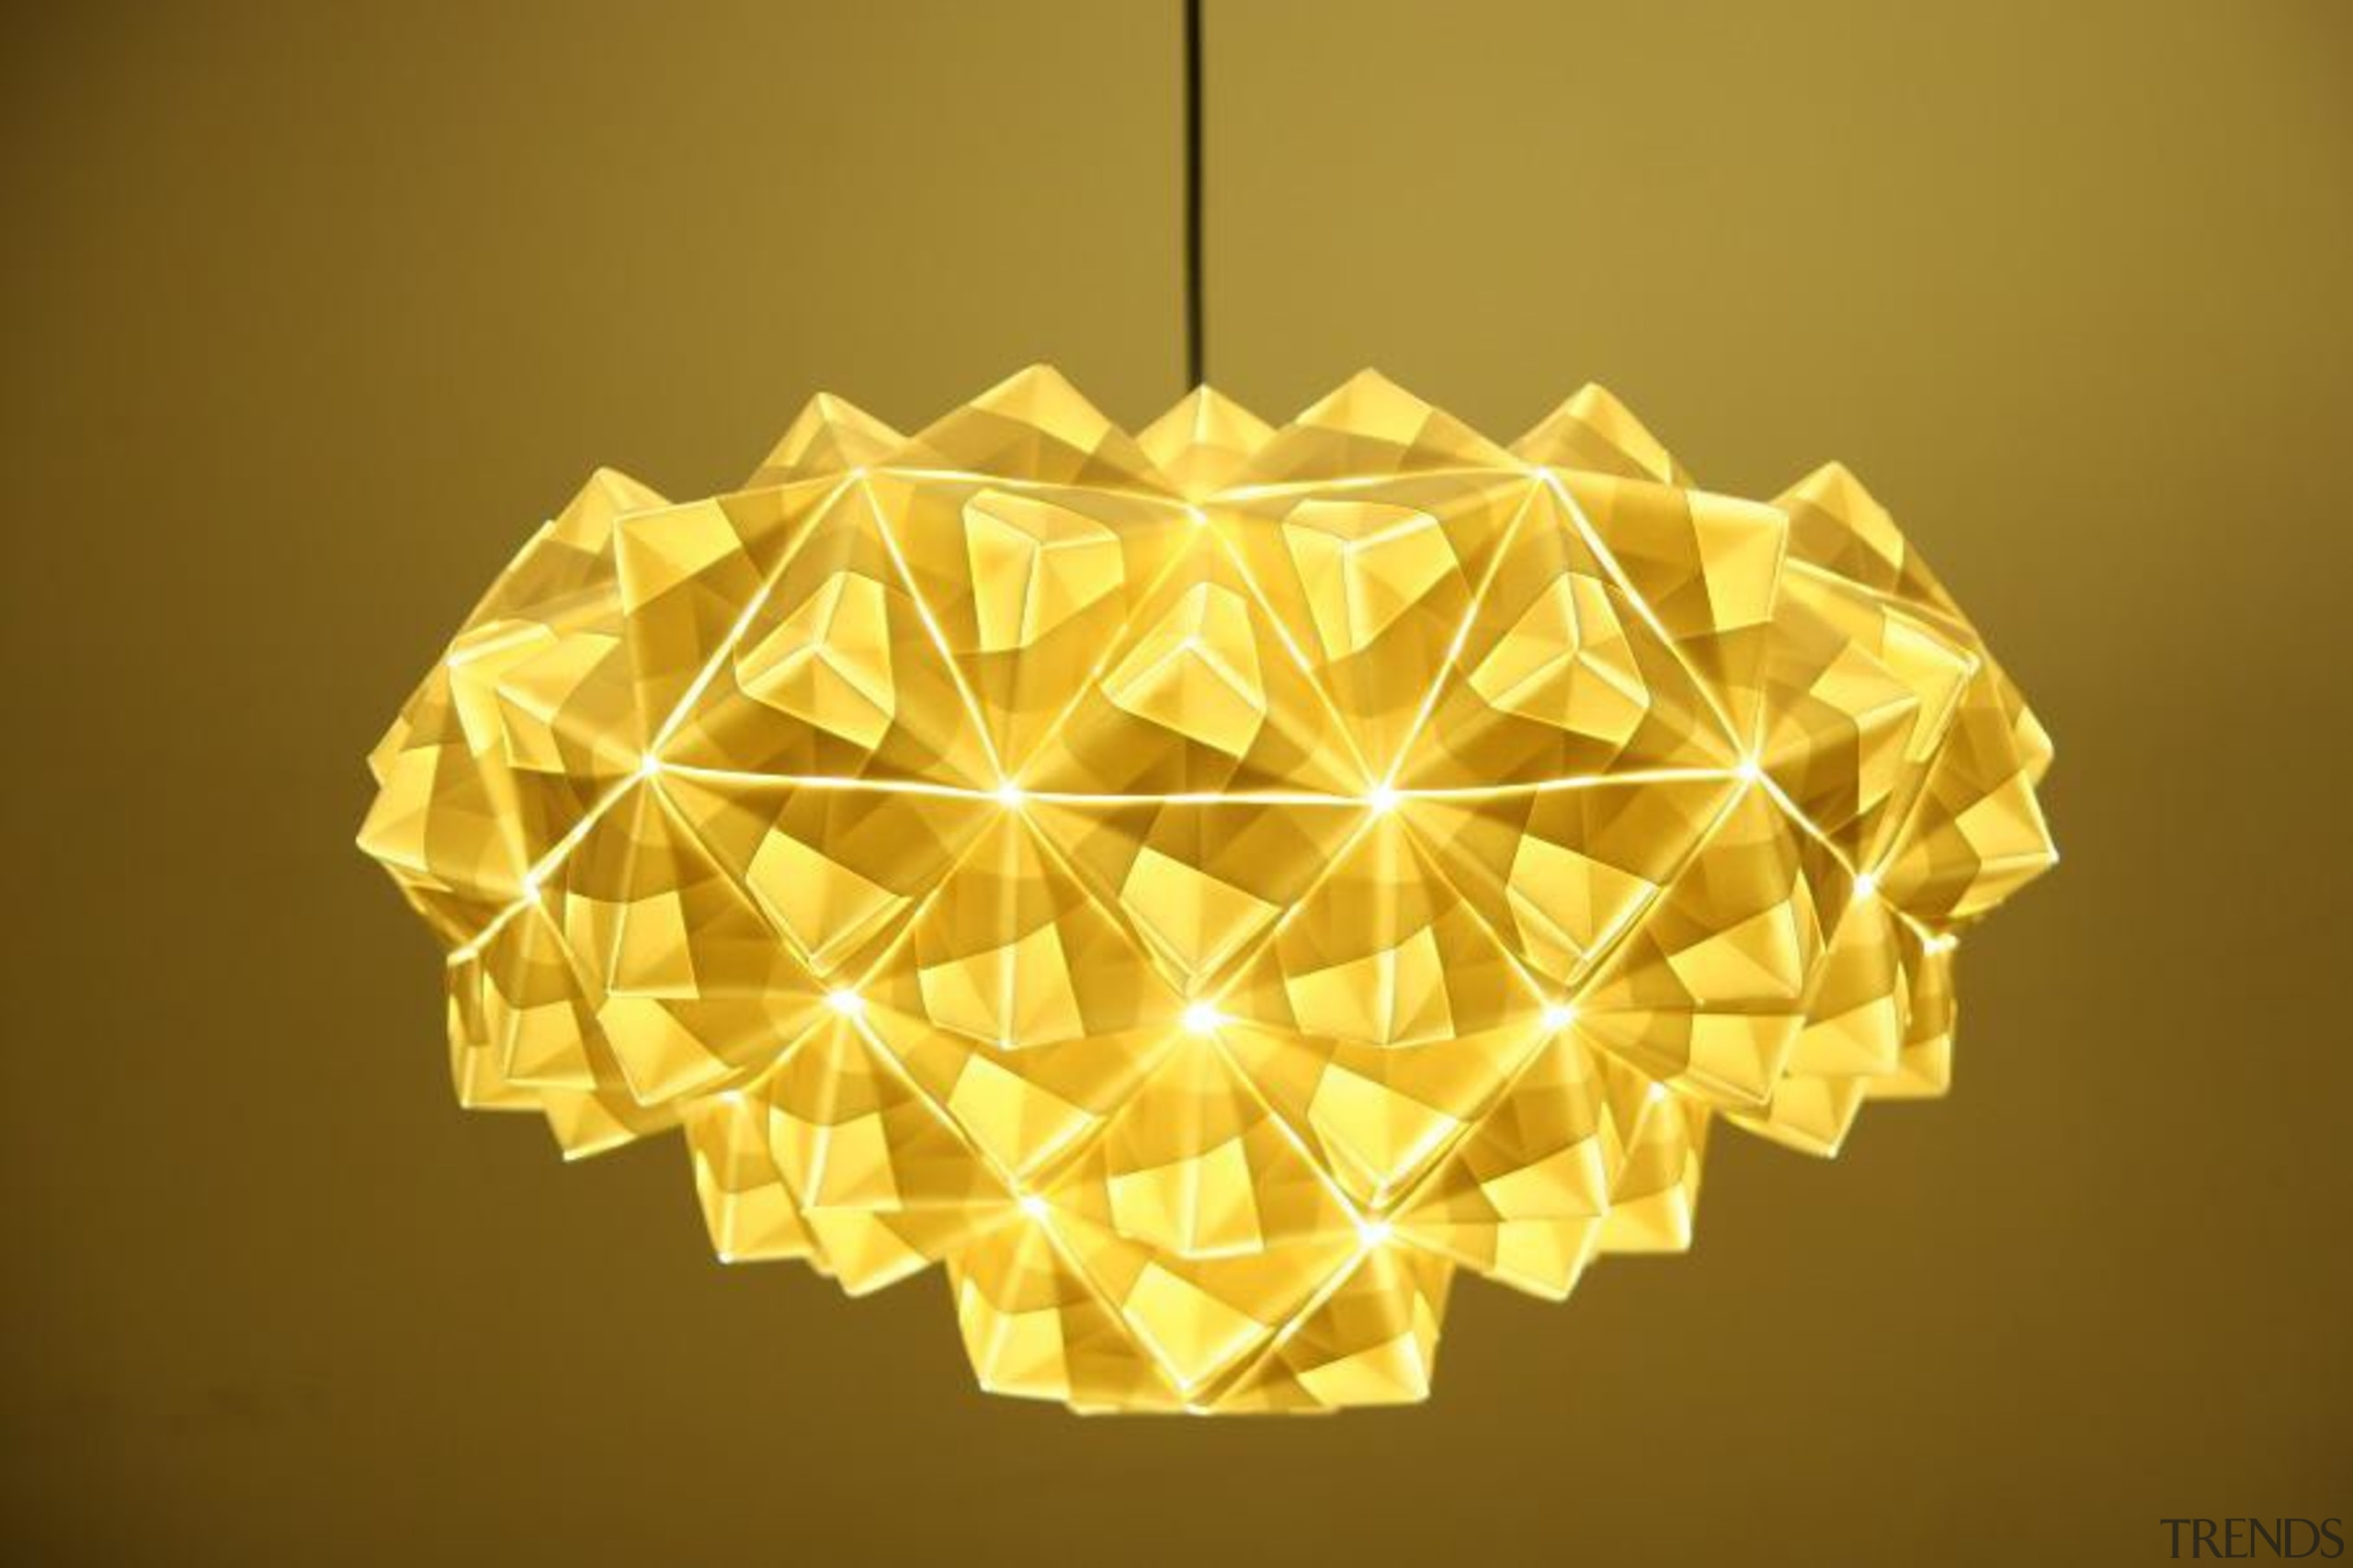 A range of folded metallic fabrics  are lampshade, light fixture, lighting, lighting accessory, origami, origami paper, product design, symmetry, yellow, brown, orange